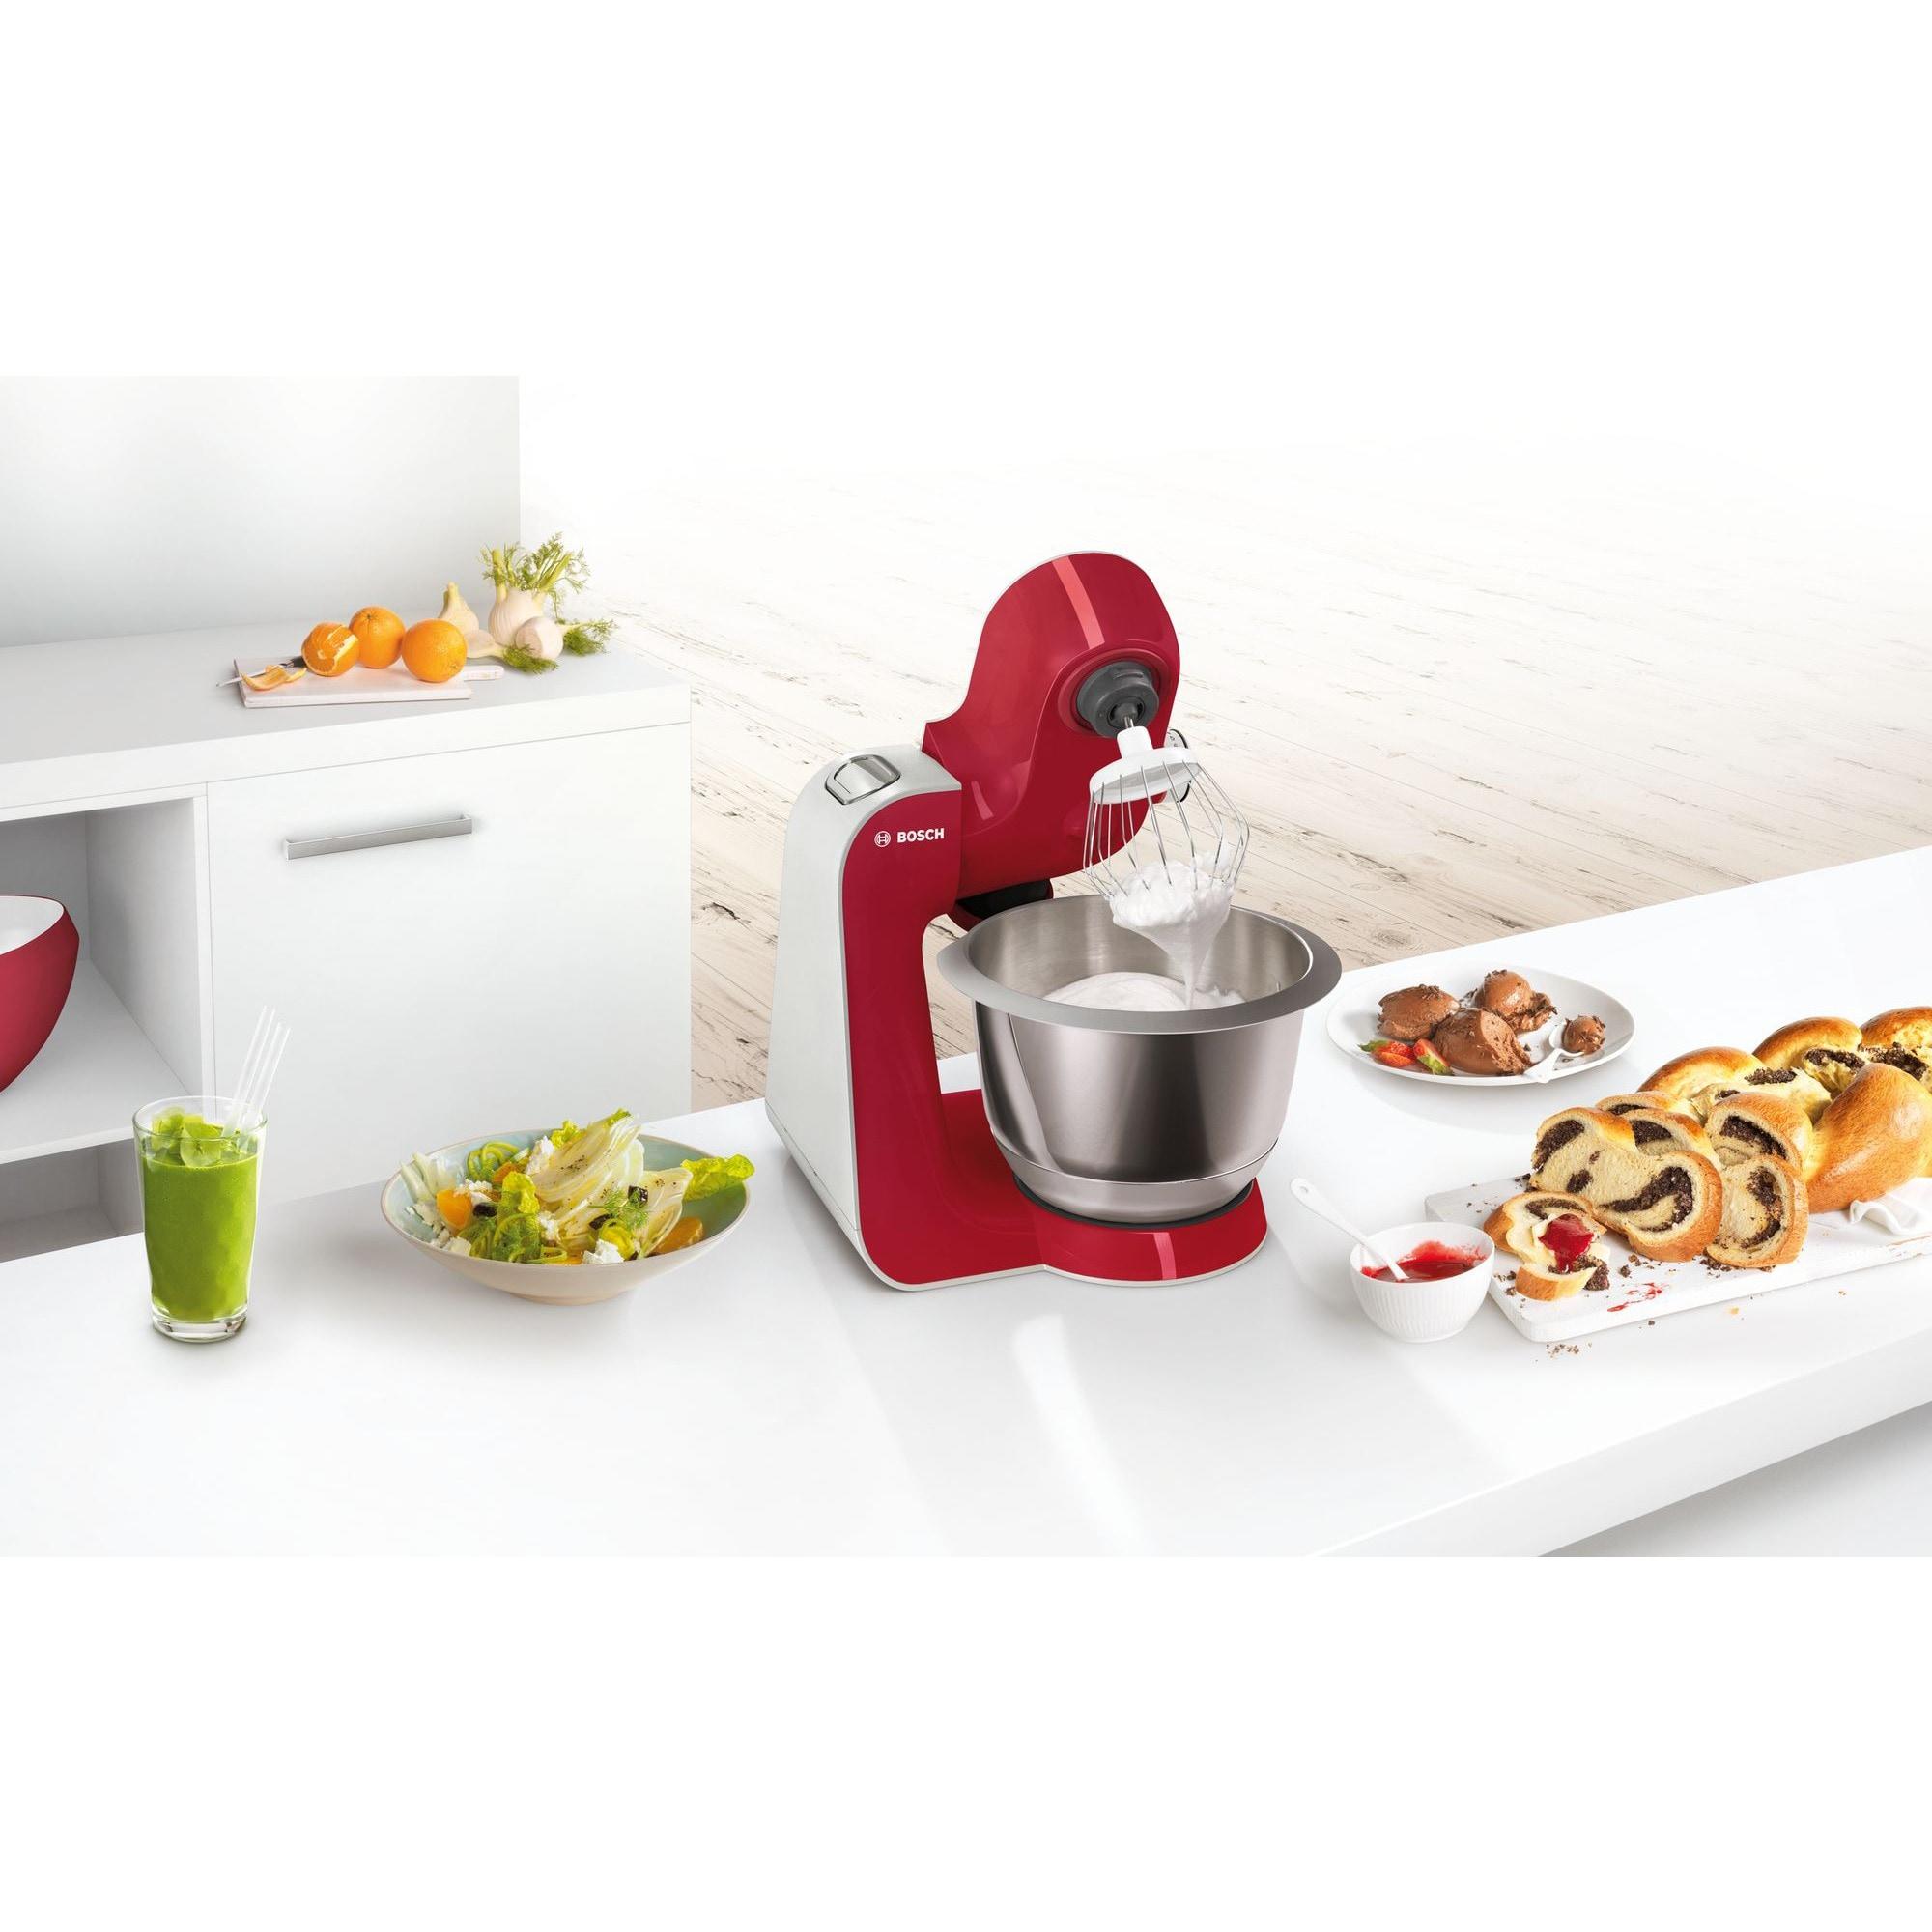 Bosch Küchenmaschine MUM58720 rot-silber